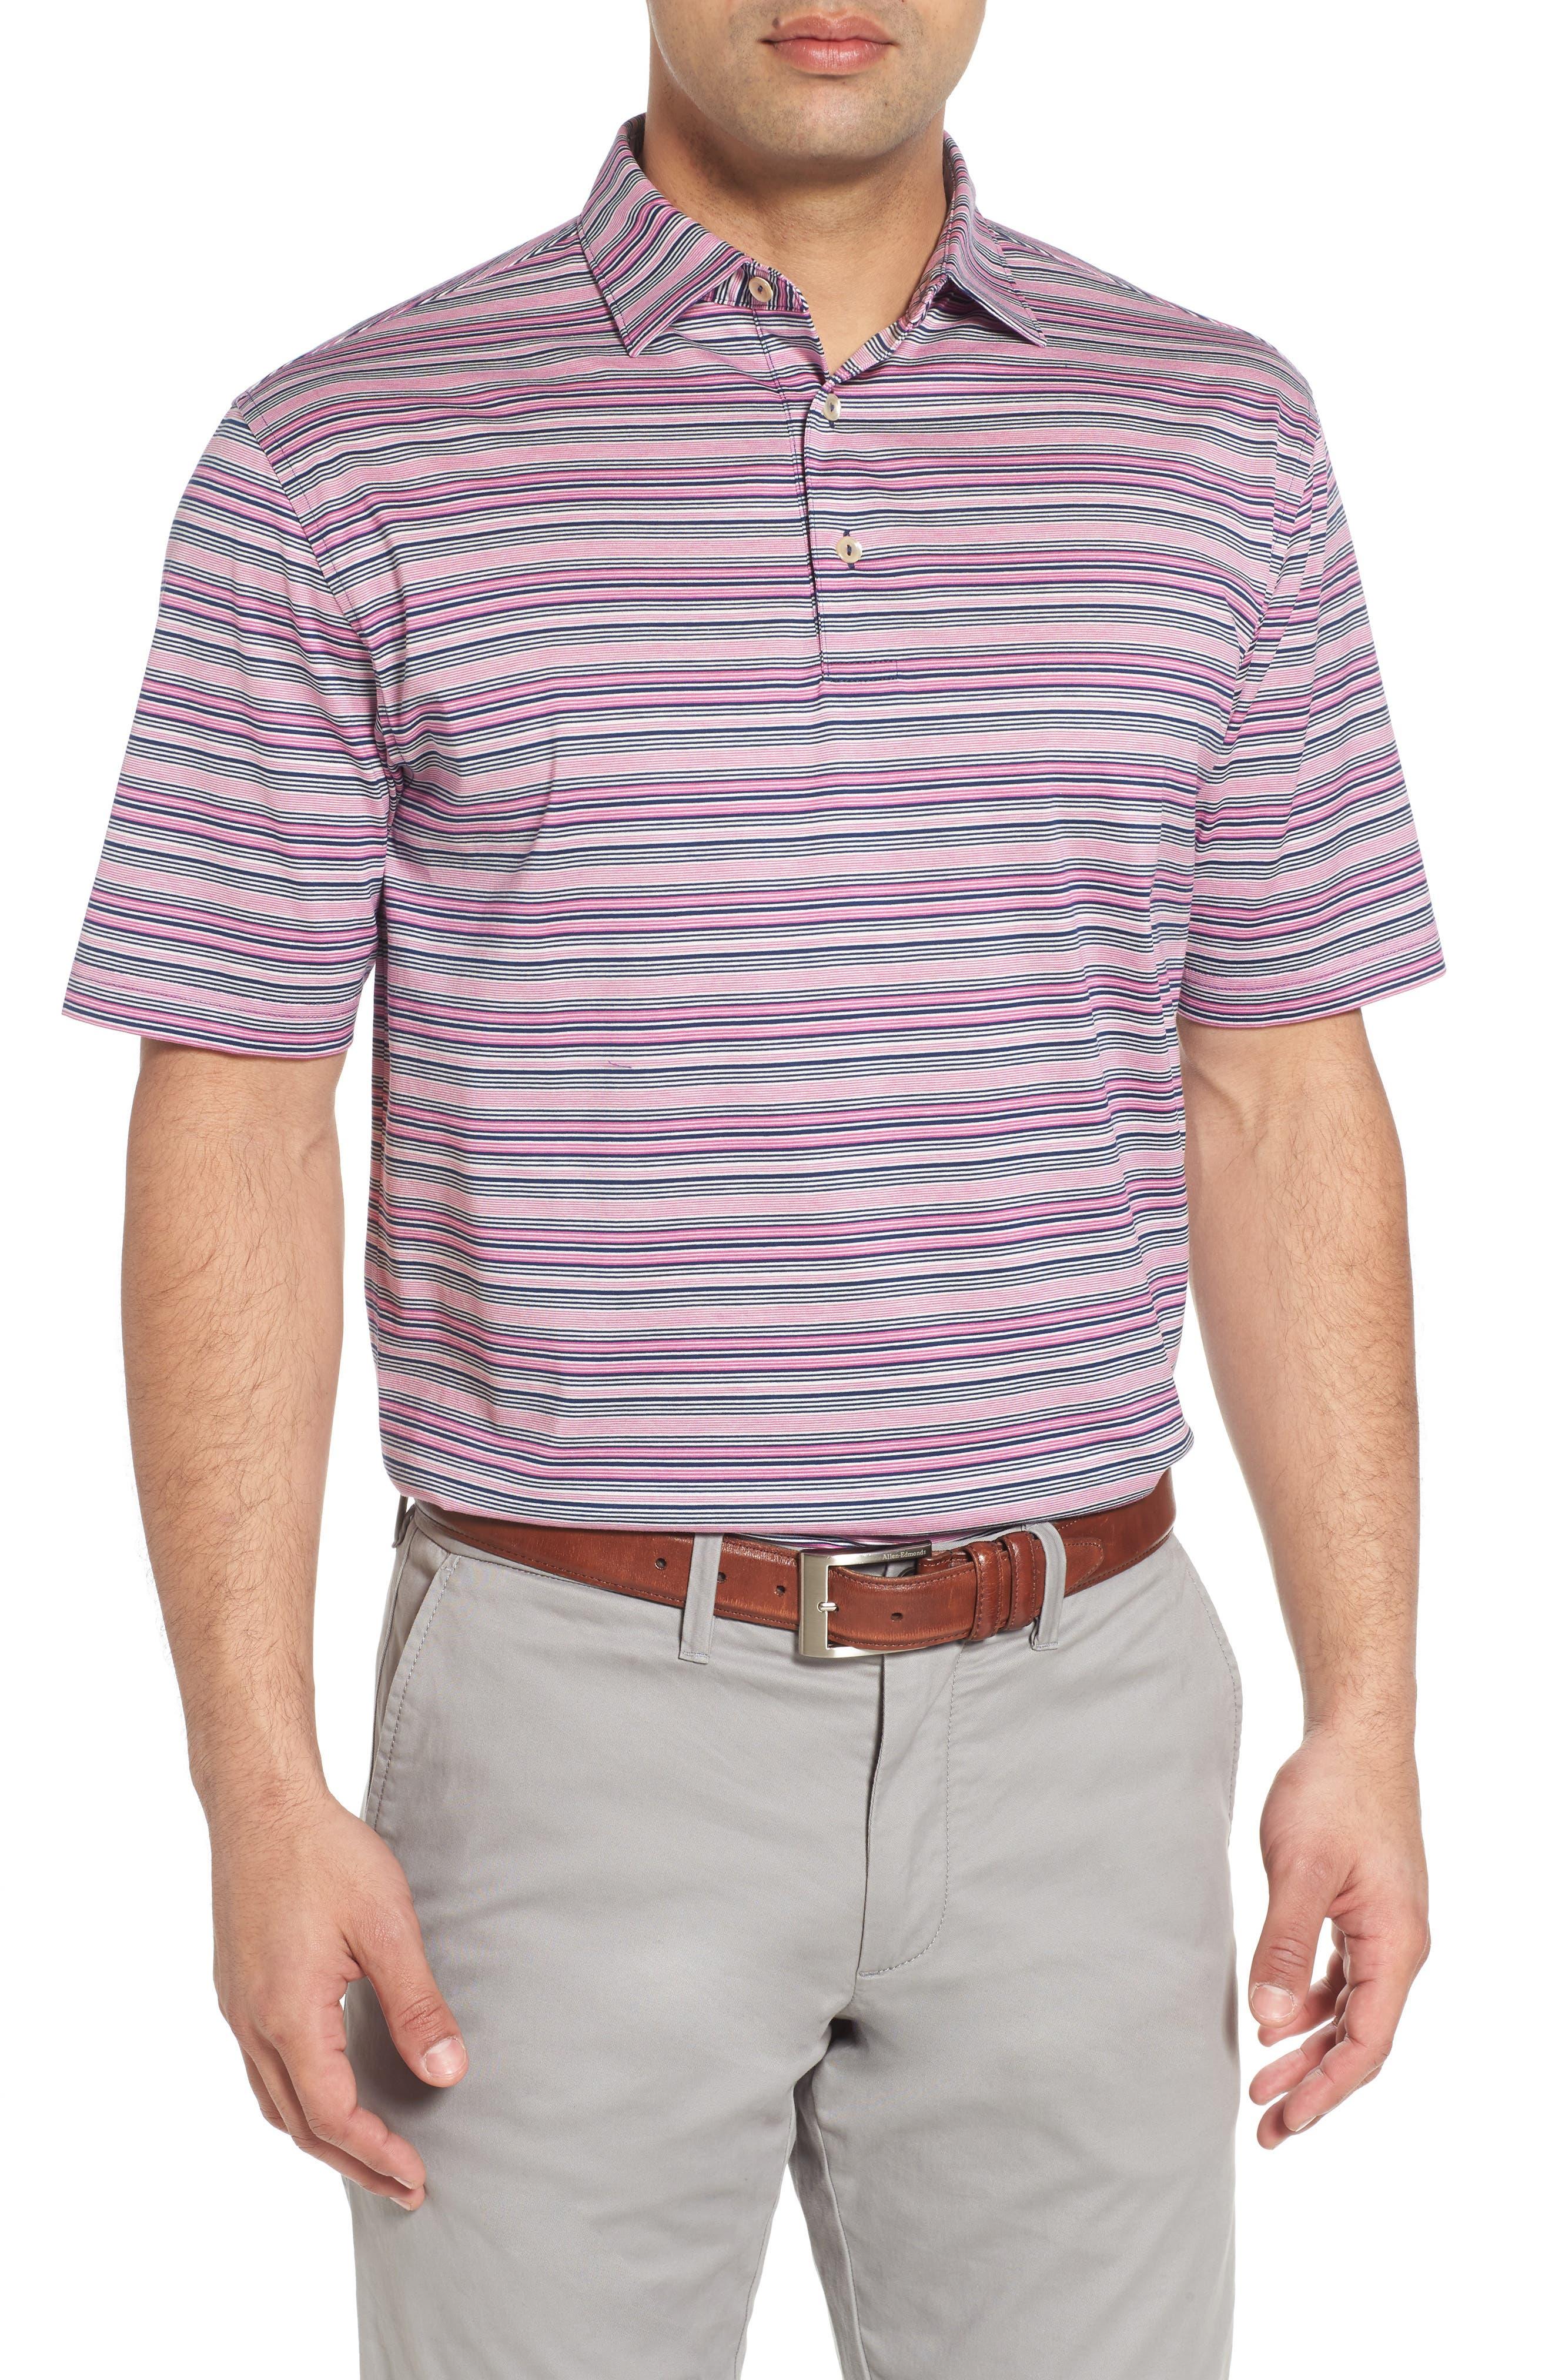 Sean Hanover Stripe Polo,                             Main thumbnail 1, color,                             437